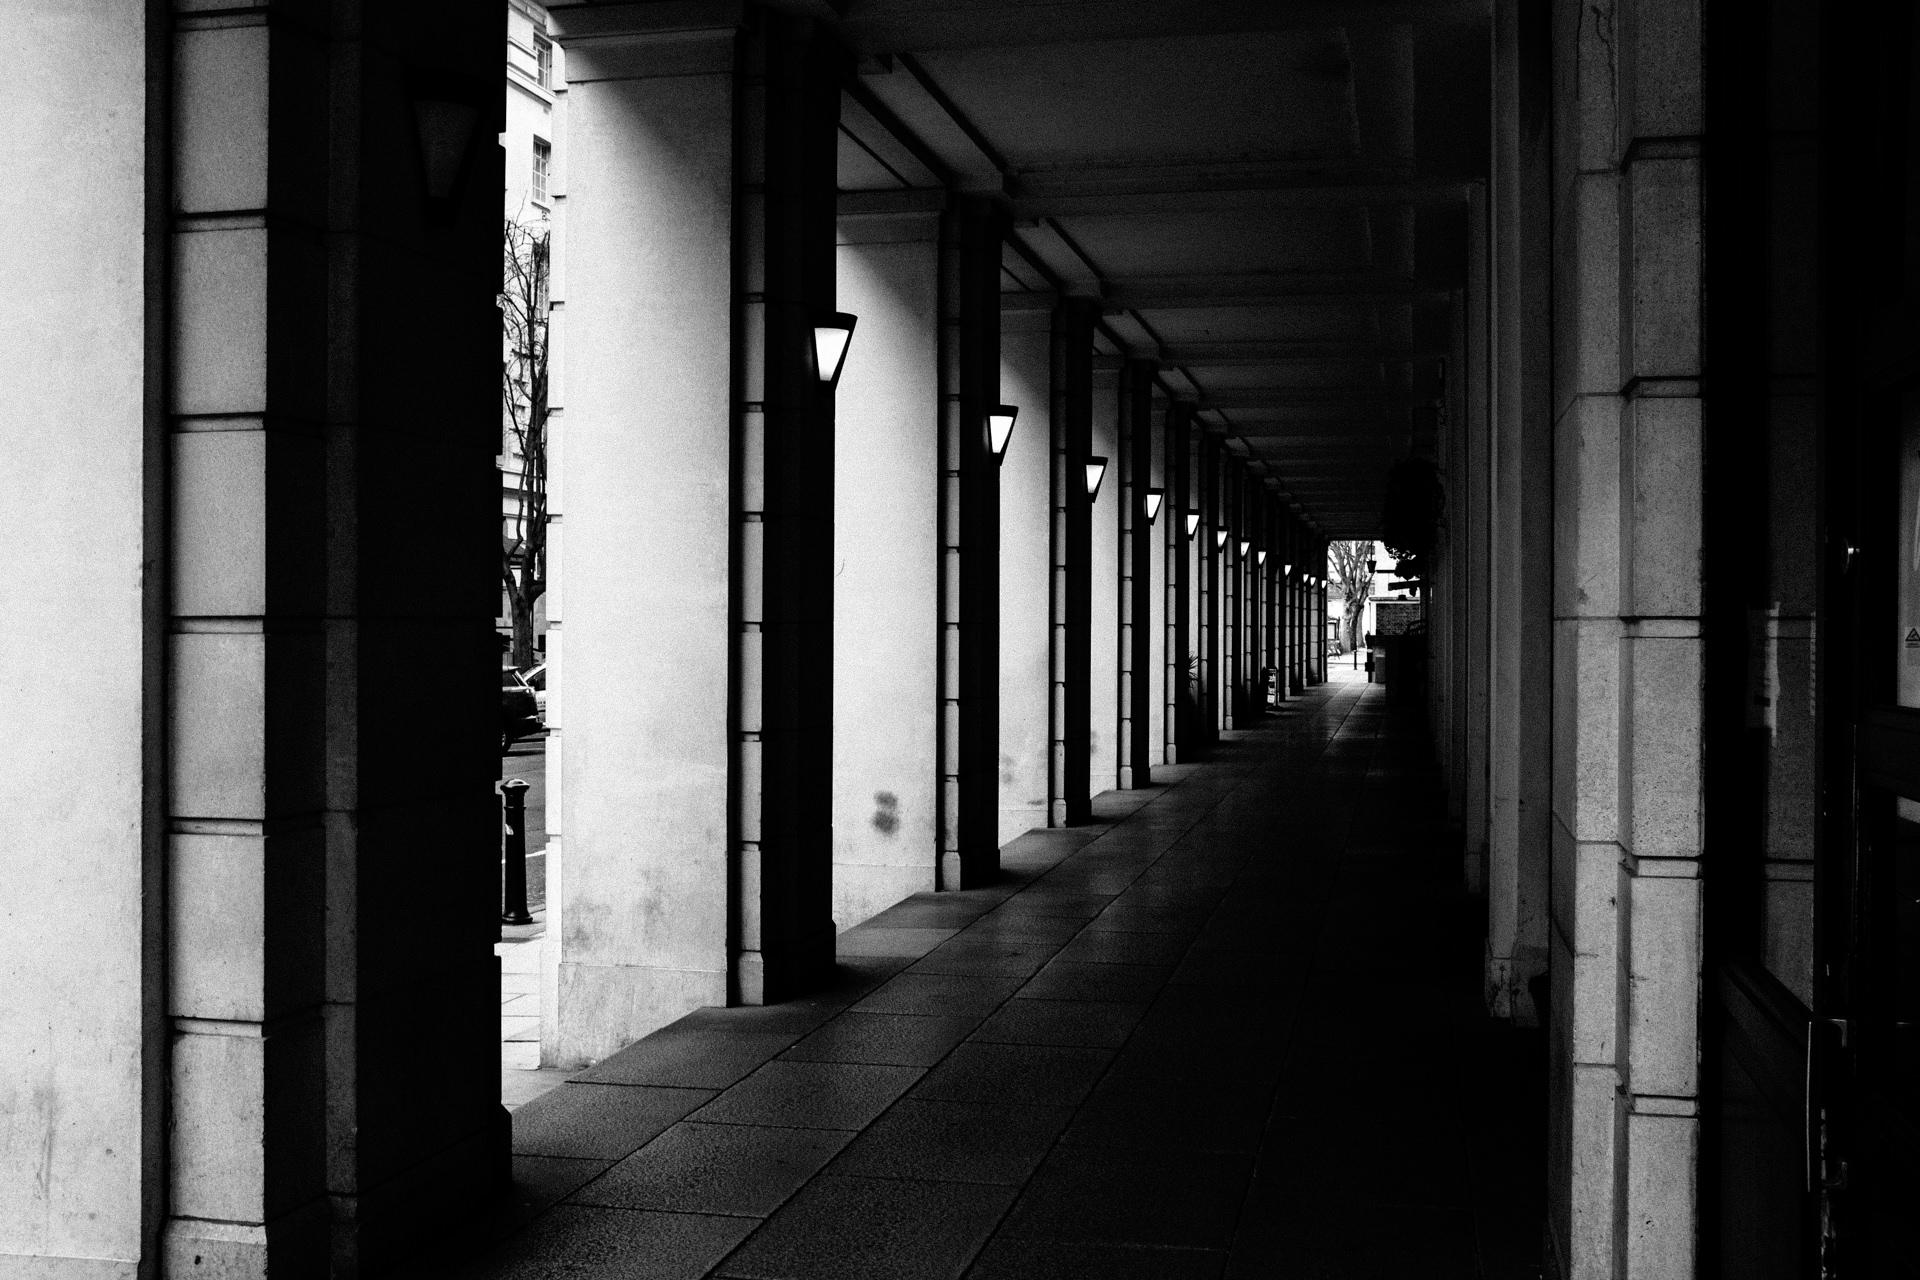 empty central london passage